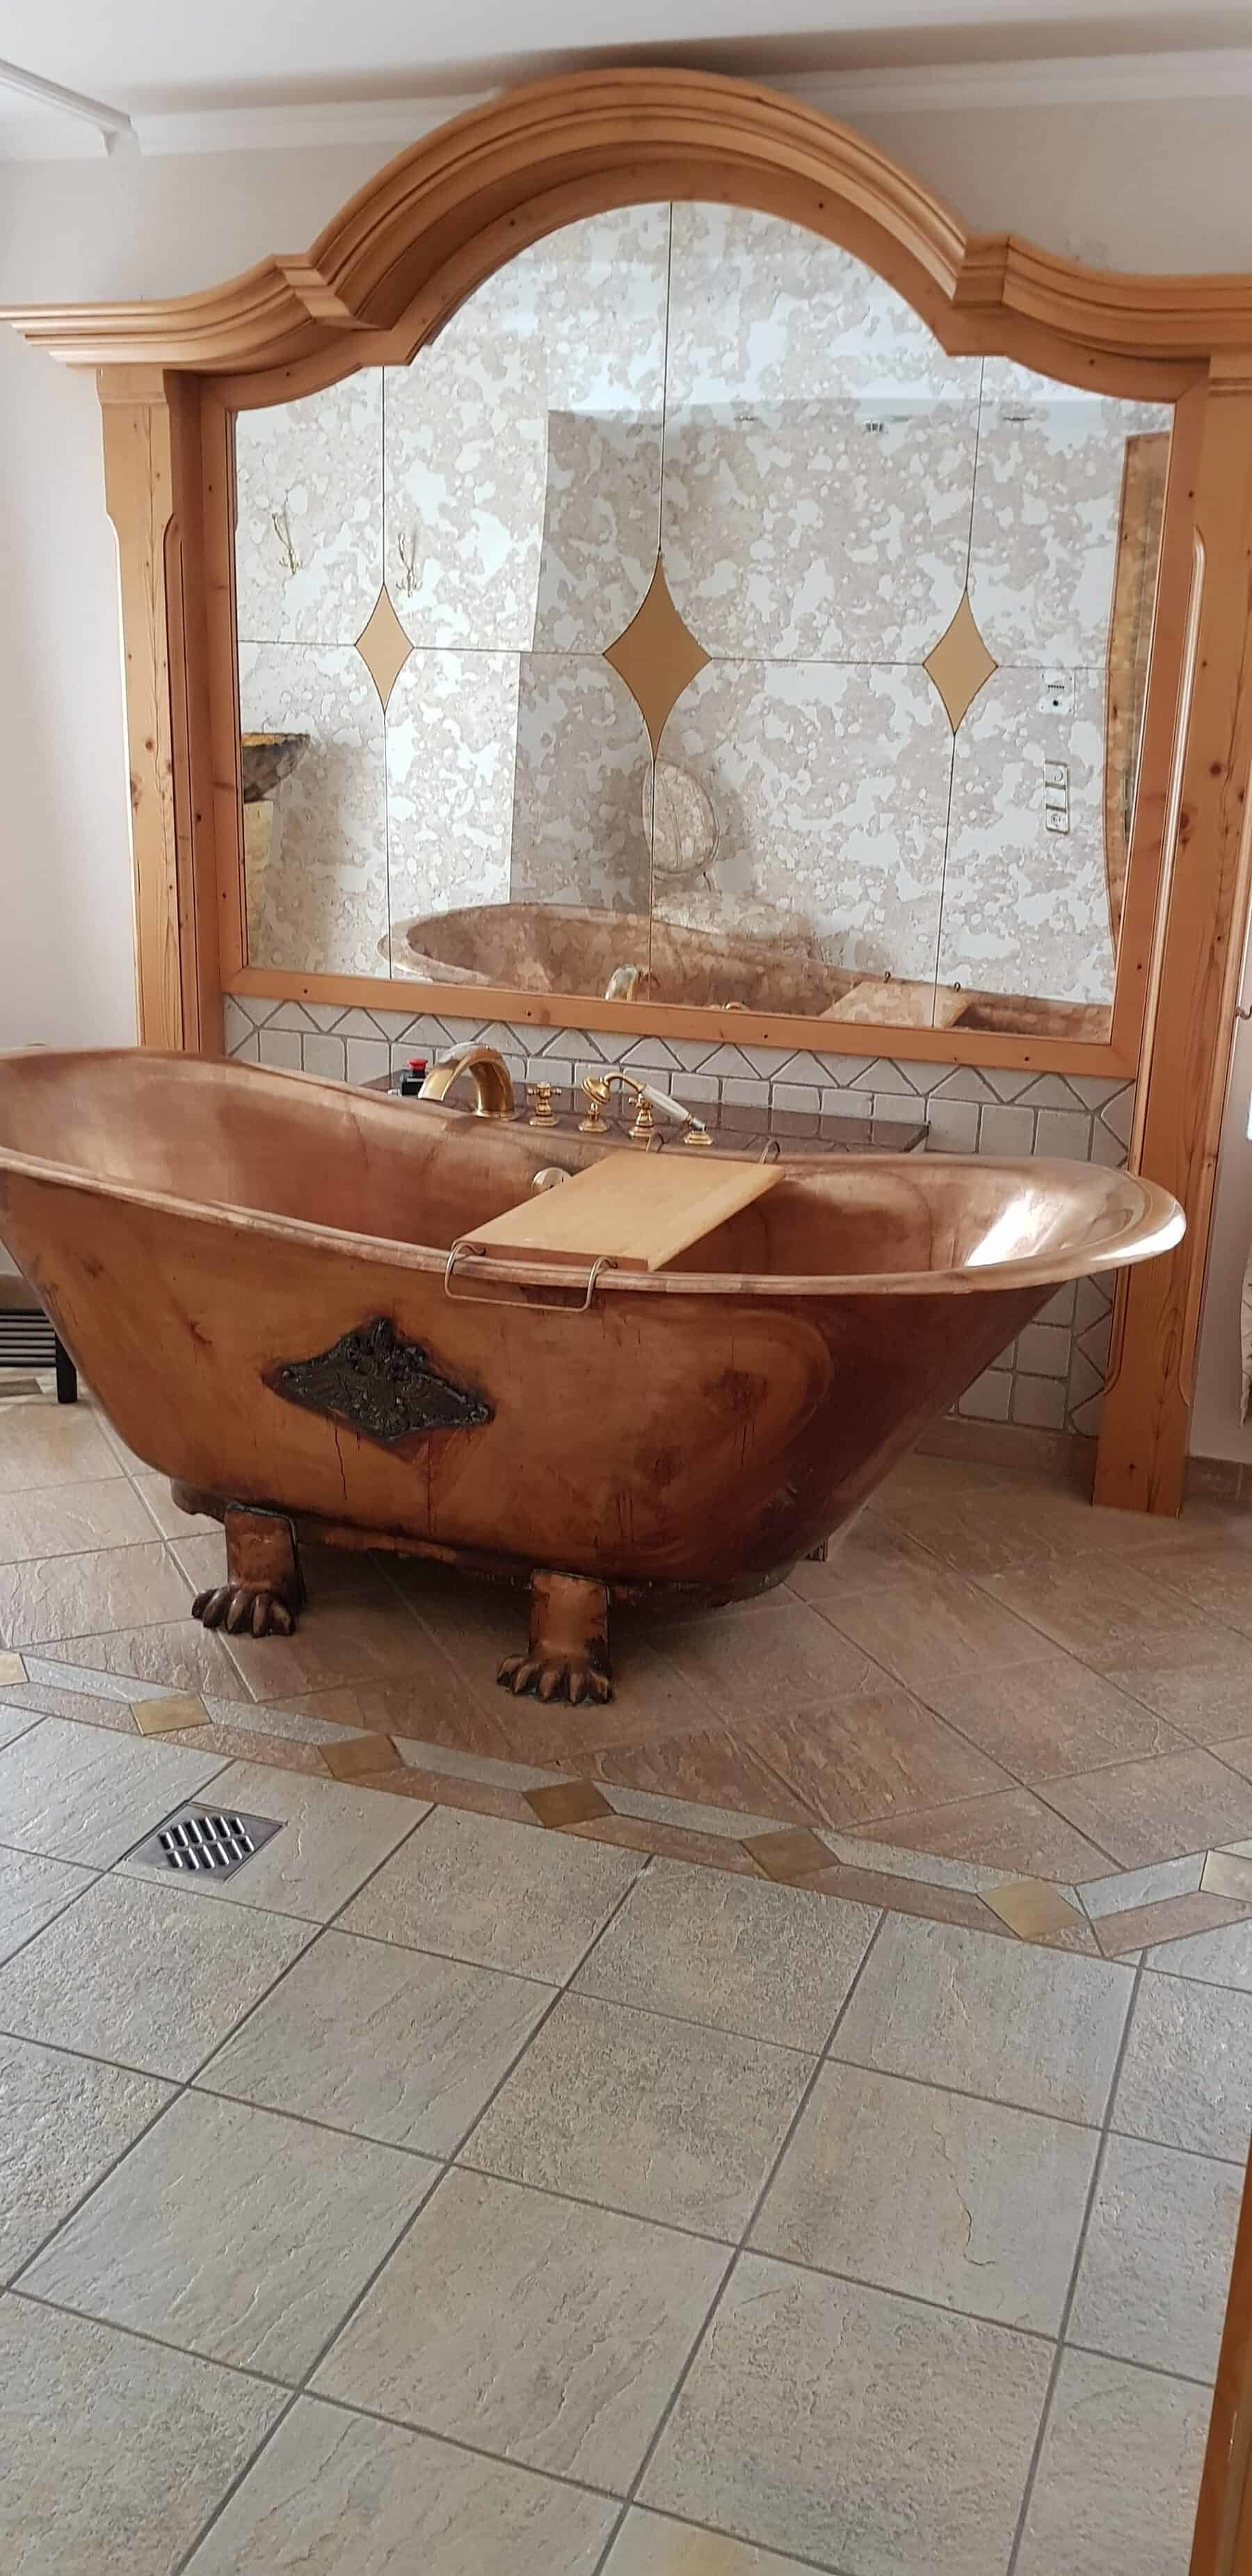 laerchenhof wellness tub